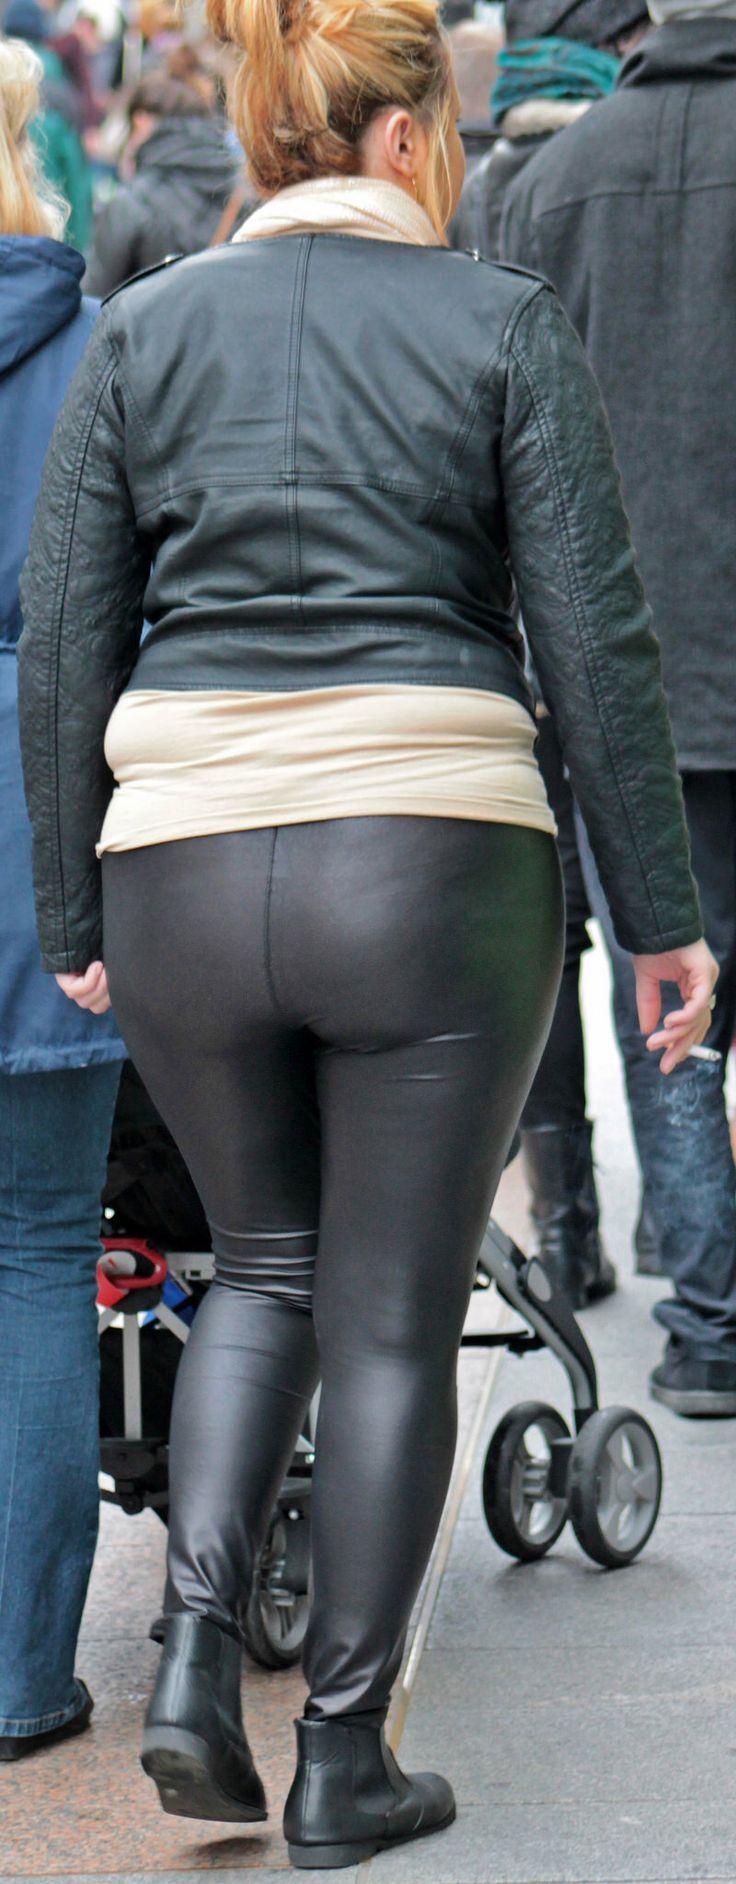 Shiny leggings candid shiny leggings   Plus Size Fashion   Pinterest   Leggings and Shiny leggings